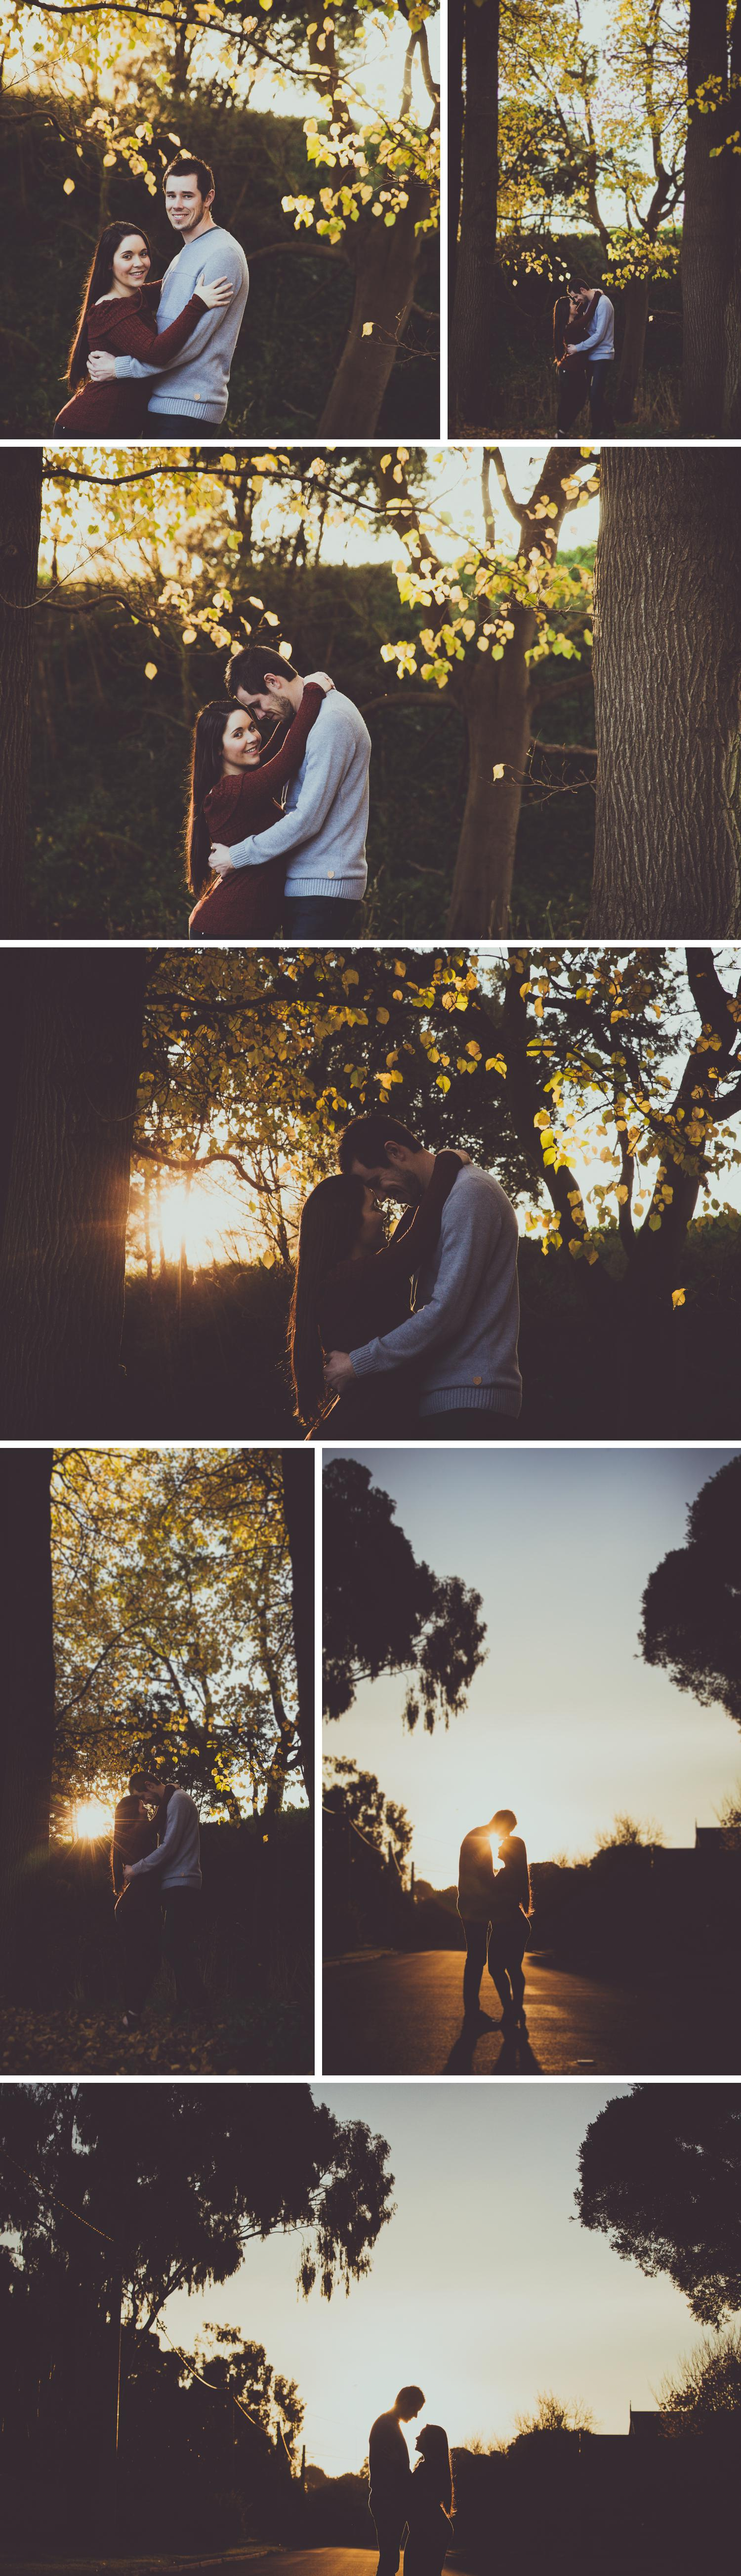 Park Photoshoot Engagement Shoot, Couple Embracing, Soft Light by Danae Studios